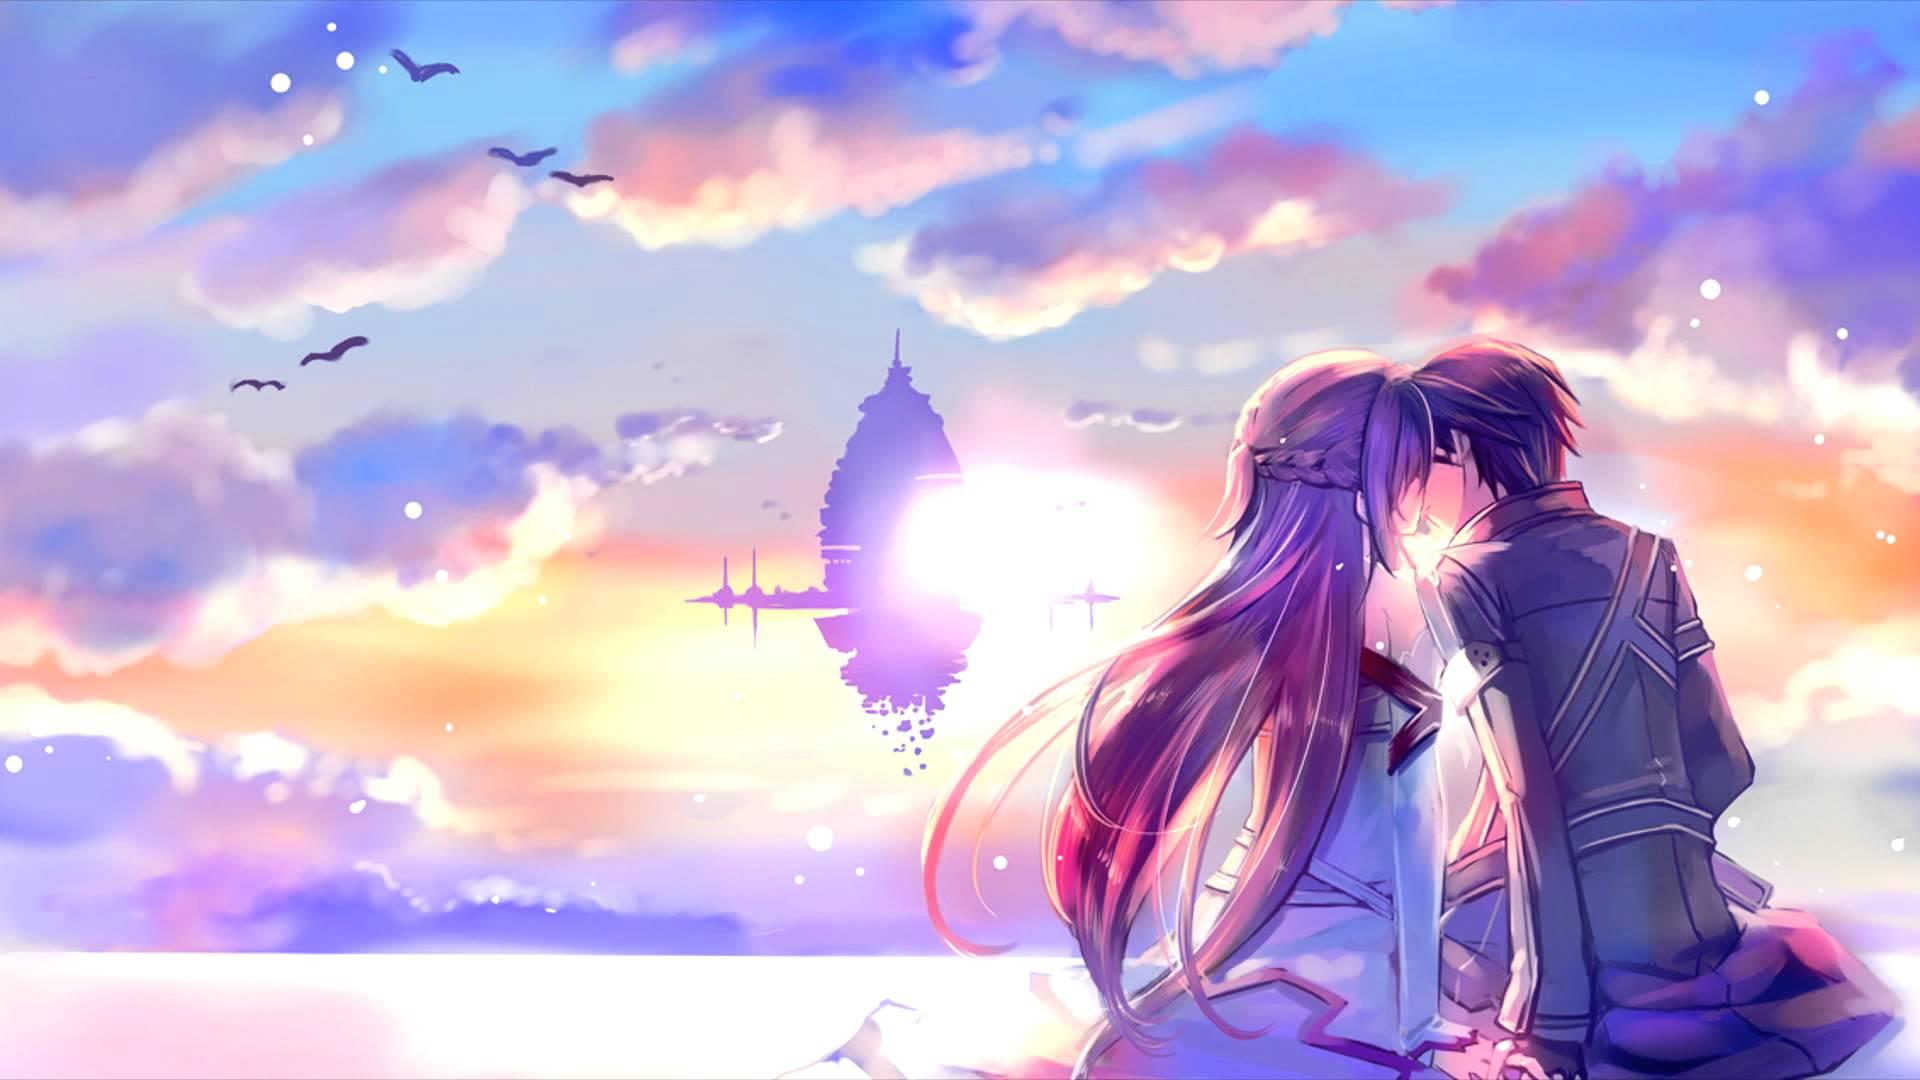 hd anime wallpaper free download - sf wallpaper